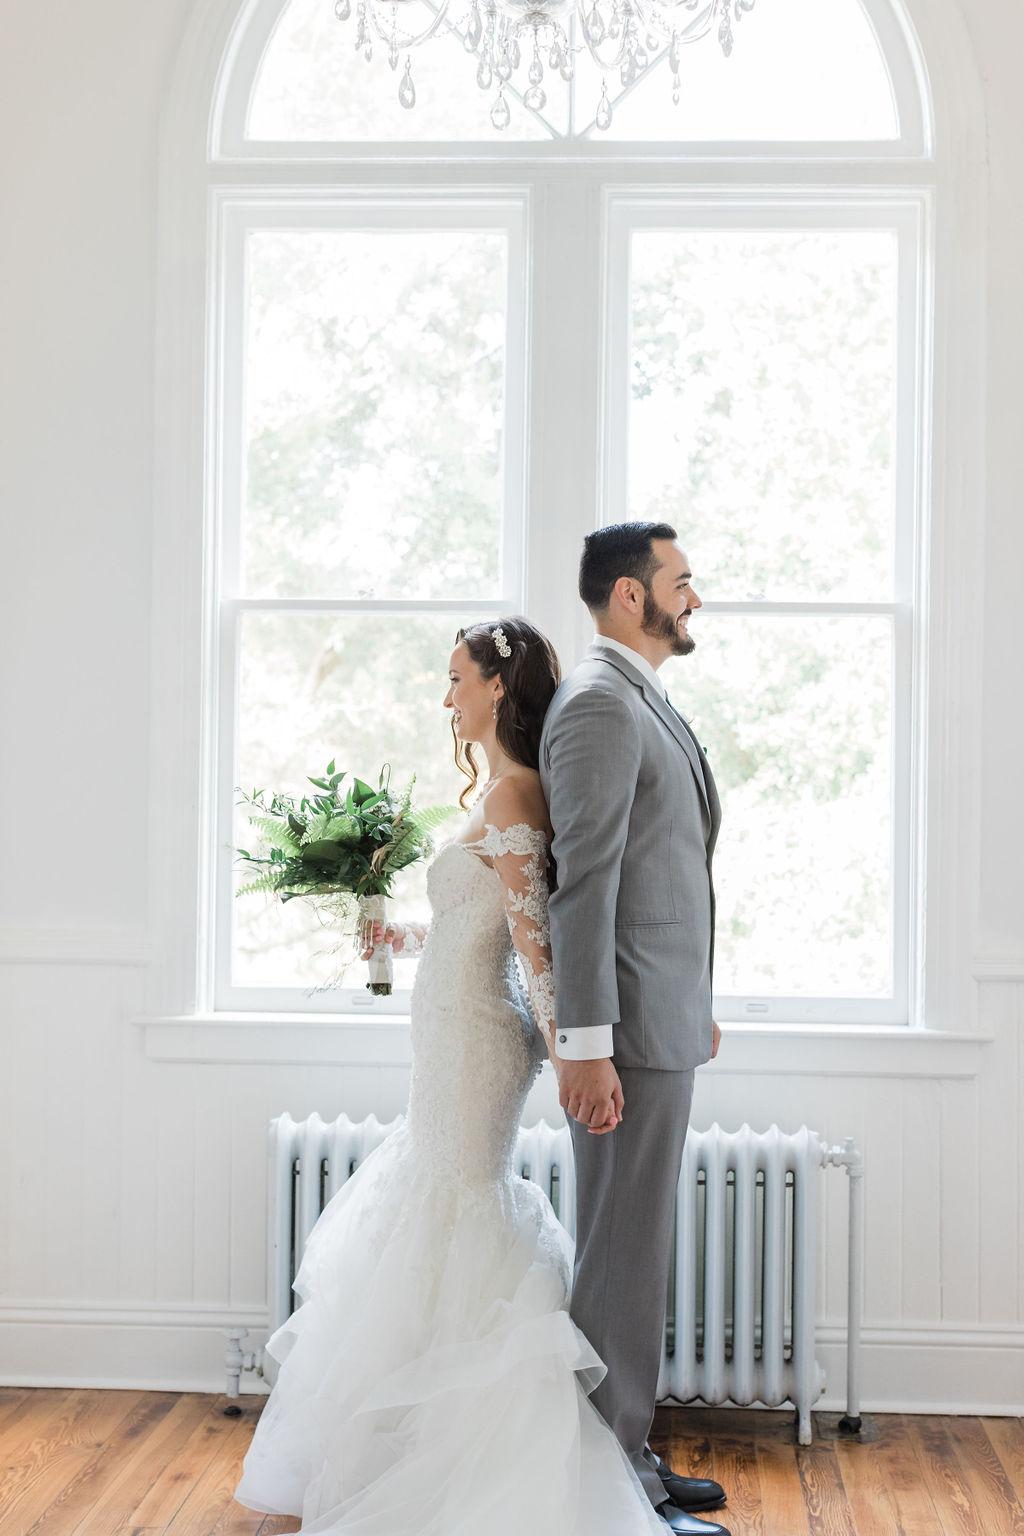 Orlando Wedding Planner | Everlasting Events